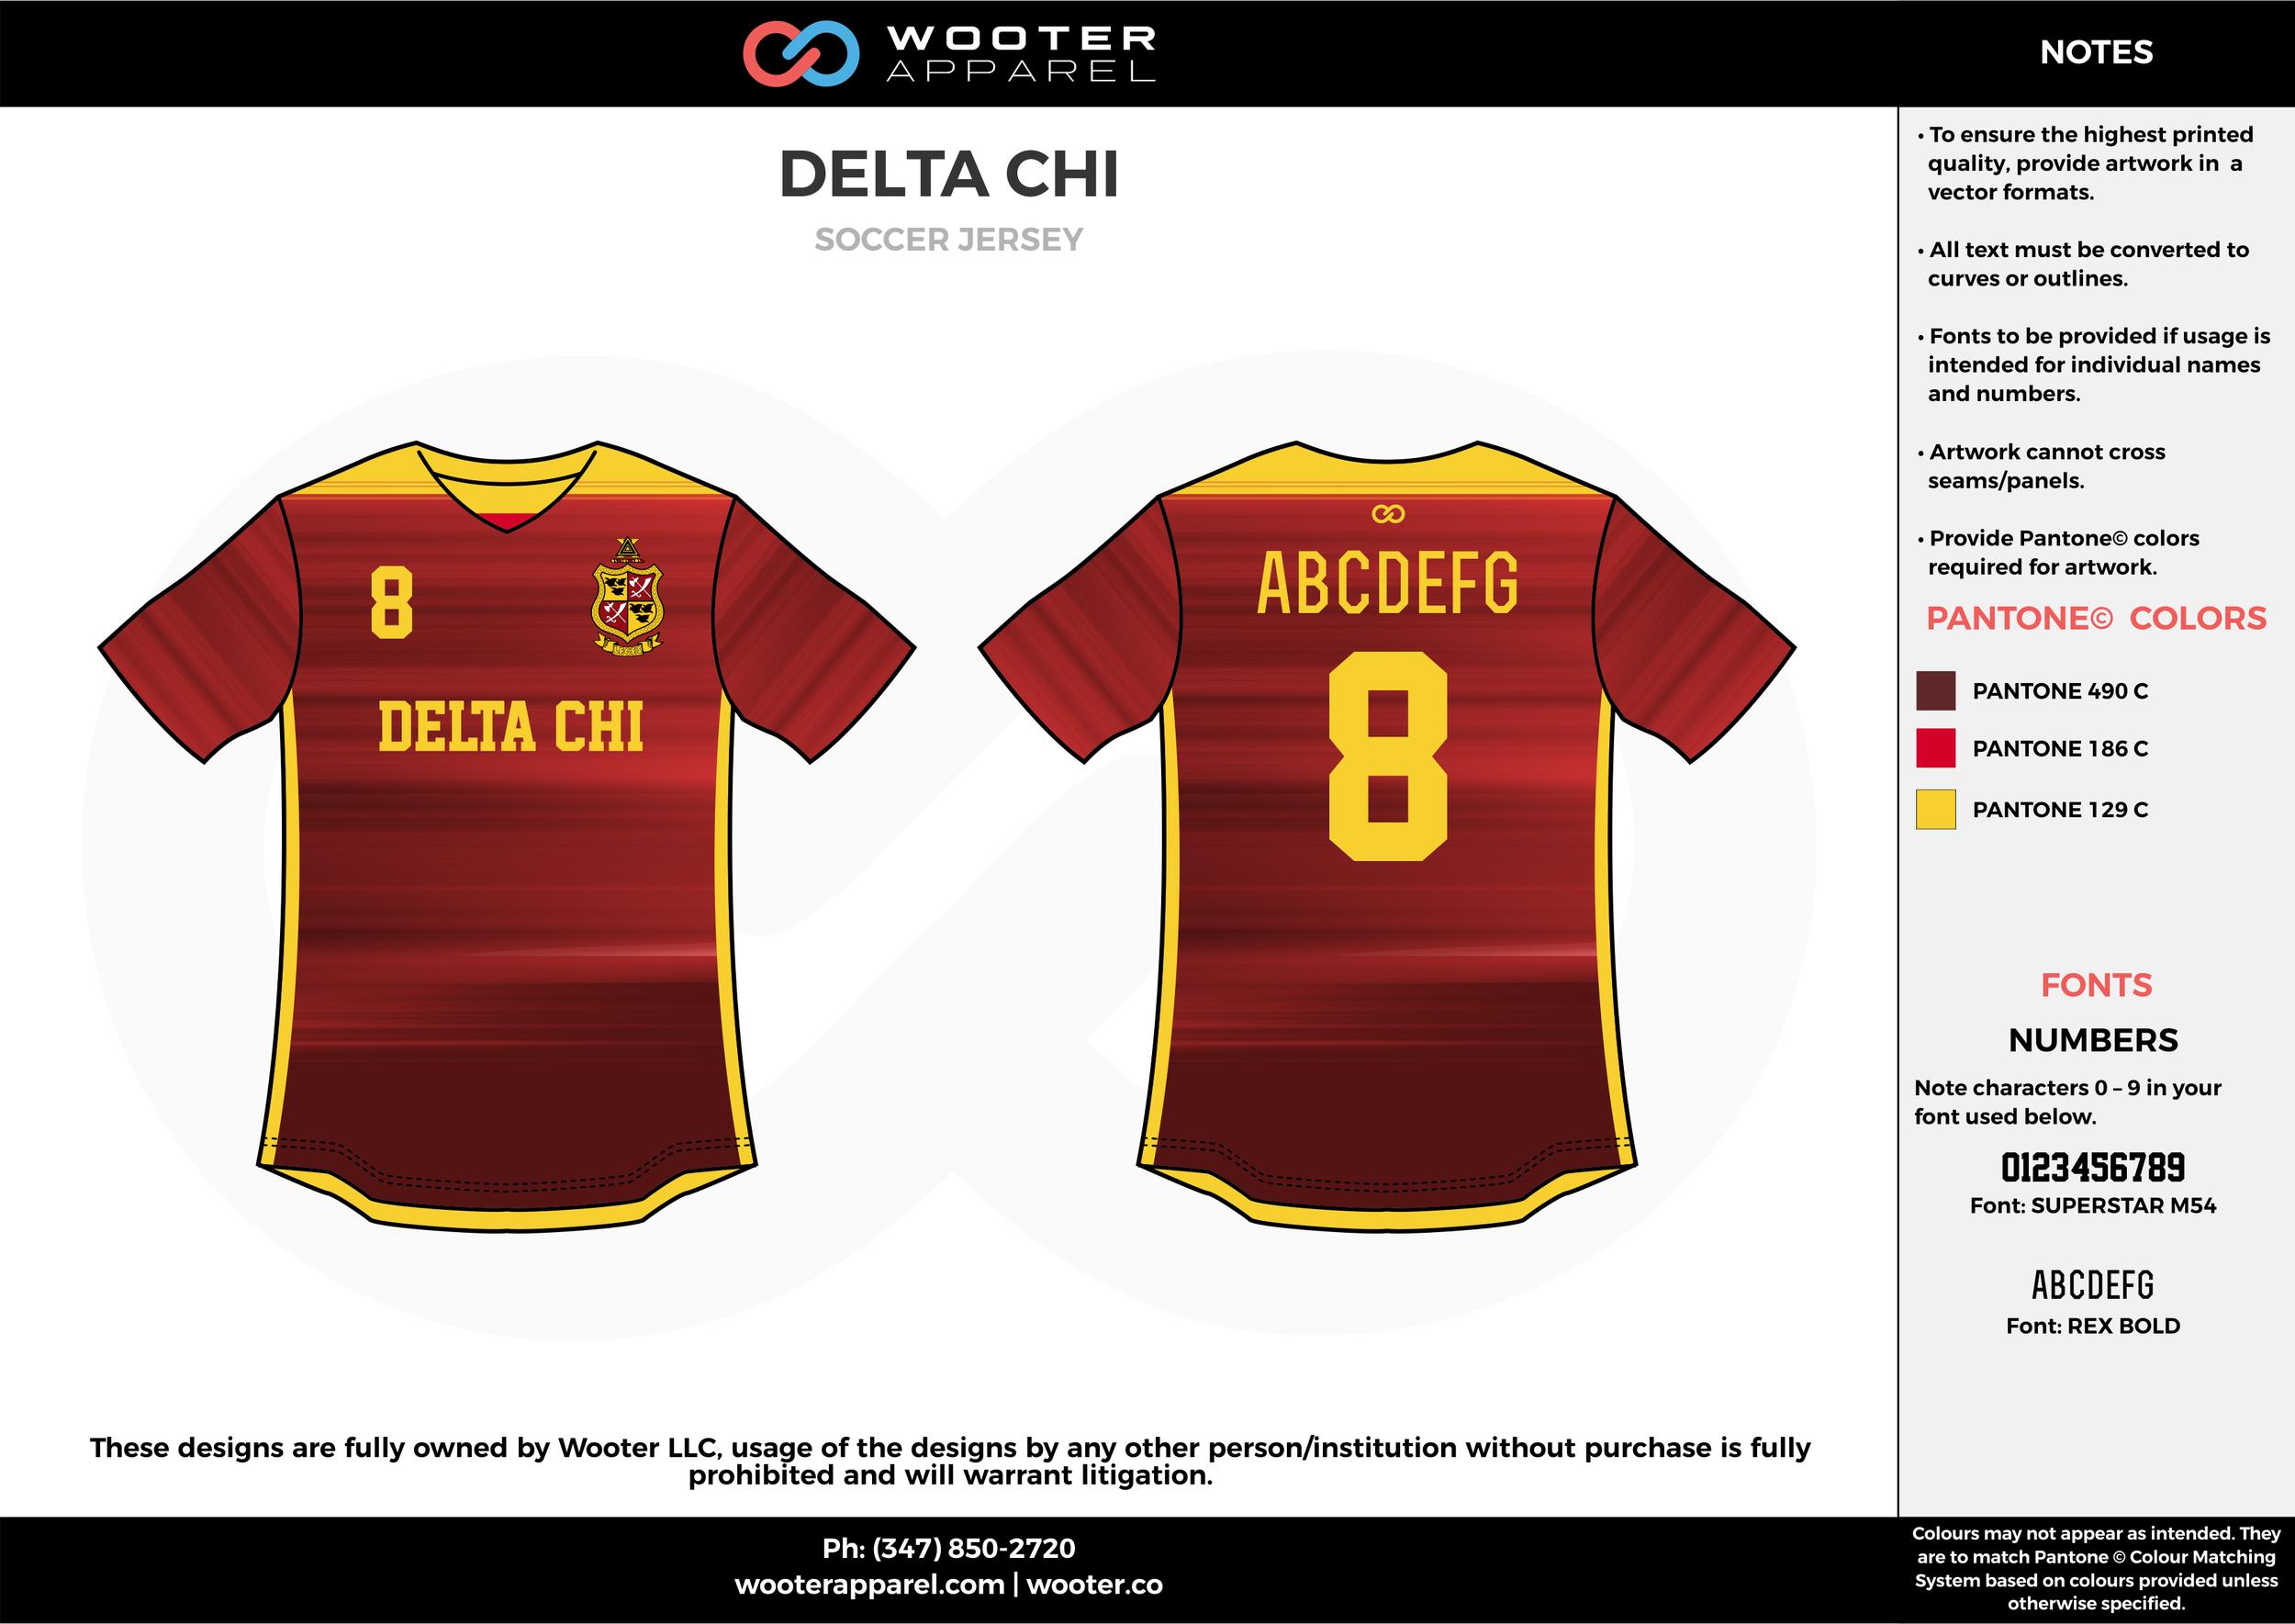 DELTA CHI maroon yellow custom sublimated soccer uniform jersey shirt